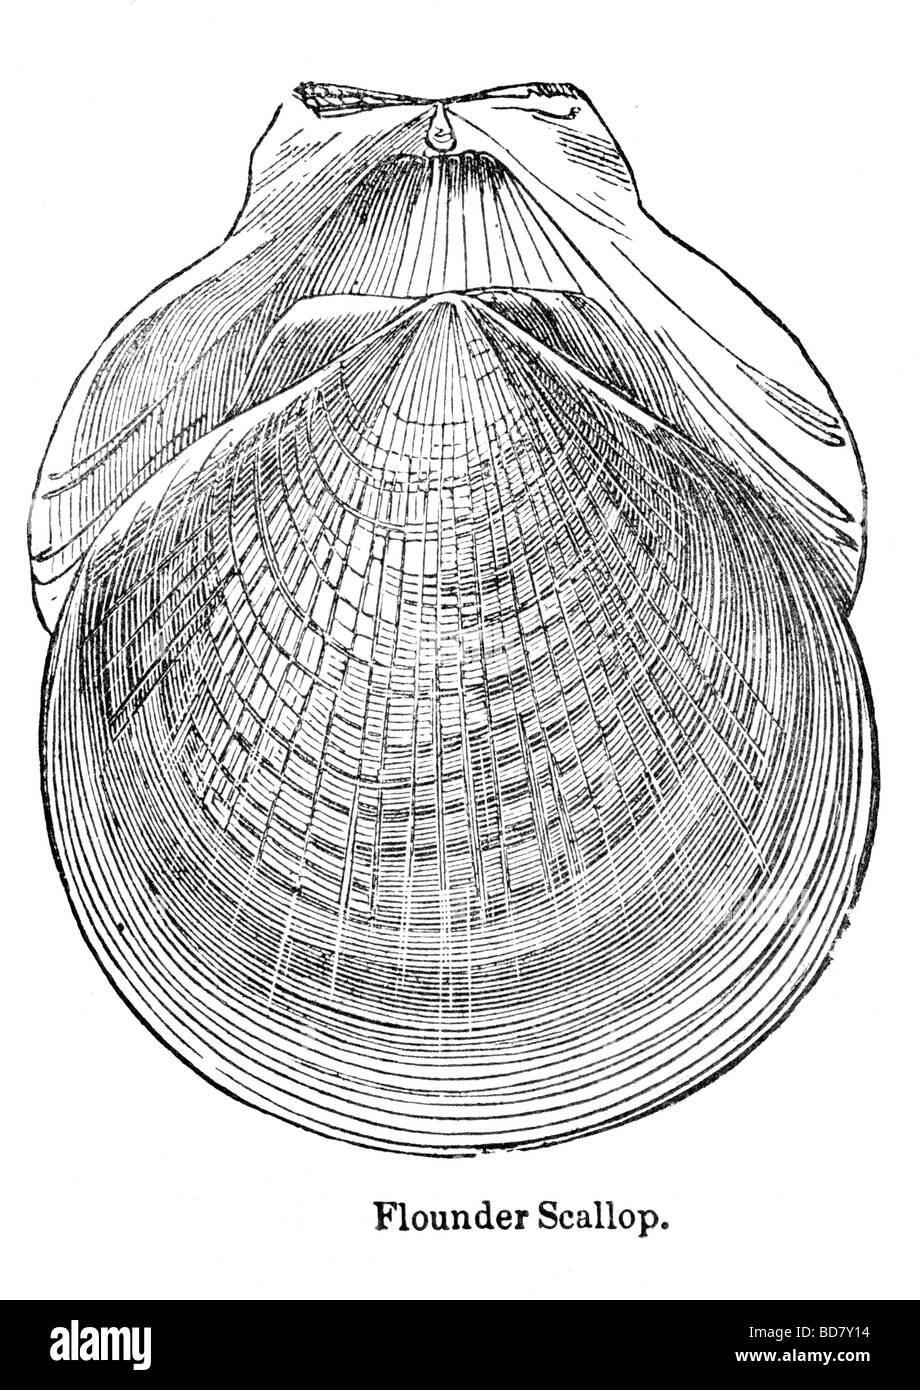 Black White Drawing Flounder Imágenes De Stock & Black White Drawing ...